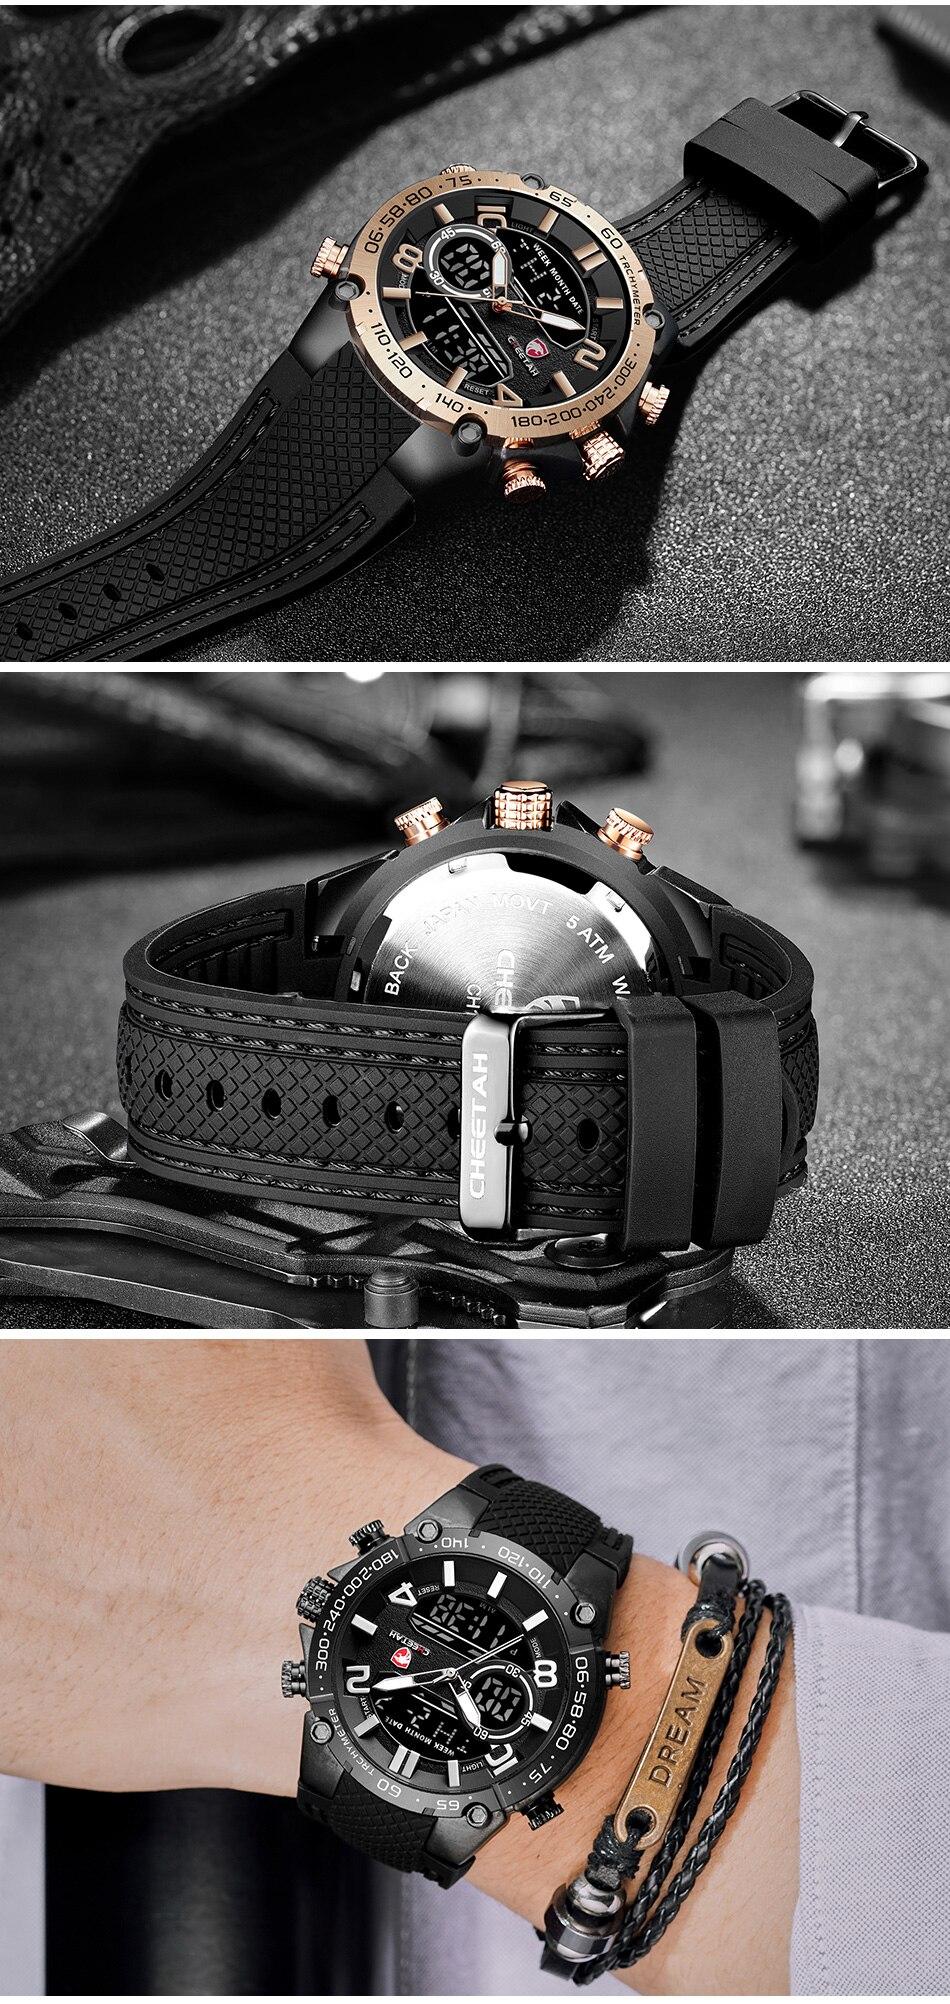 H89ff40064d044d55a480be2c1a8e3ec4E Top Luxury Brand CHEETAH Men Watch Fashion Sports Wristwatch Digital Quartz Analog Clock Waterproof Watch Men Relogio Masculino